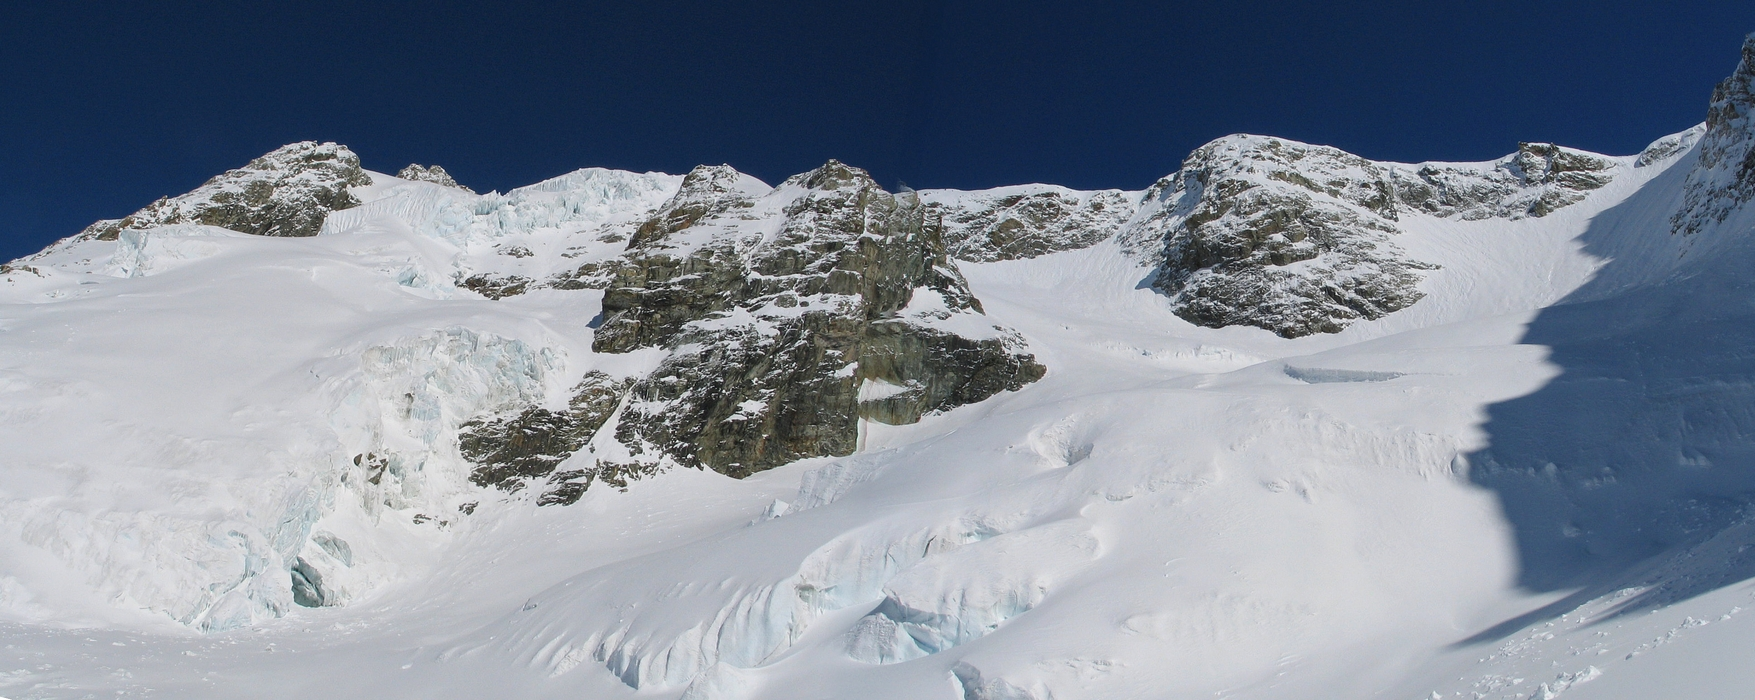 Sattelhorn Berner Alpen / Alpes bernoises Switzerland panorama 04